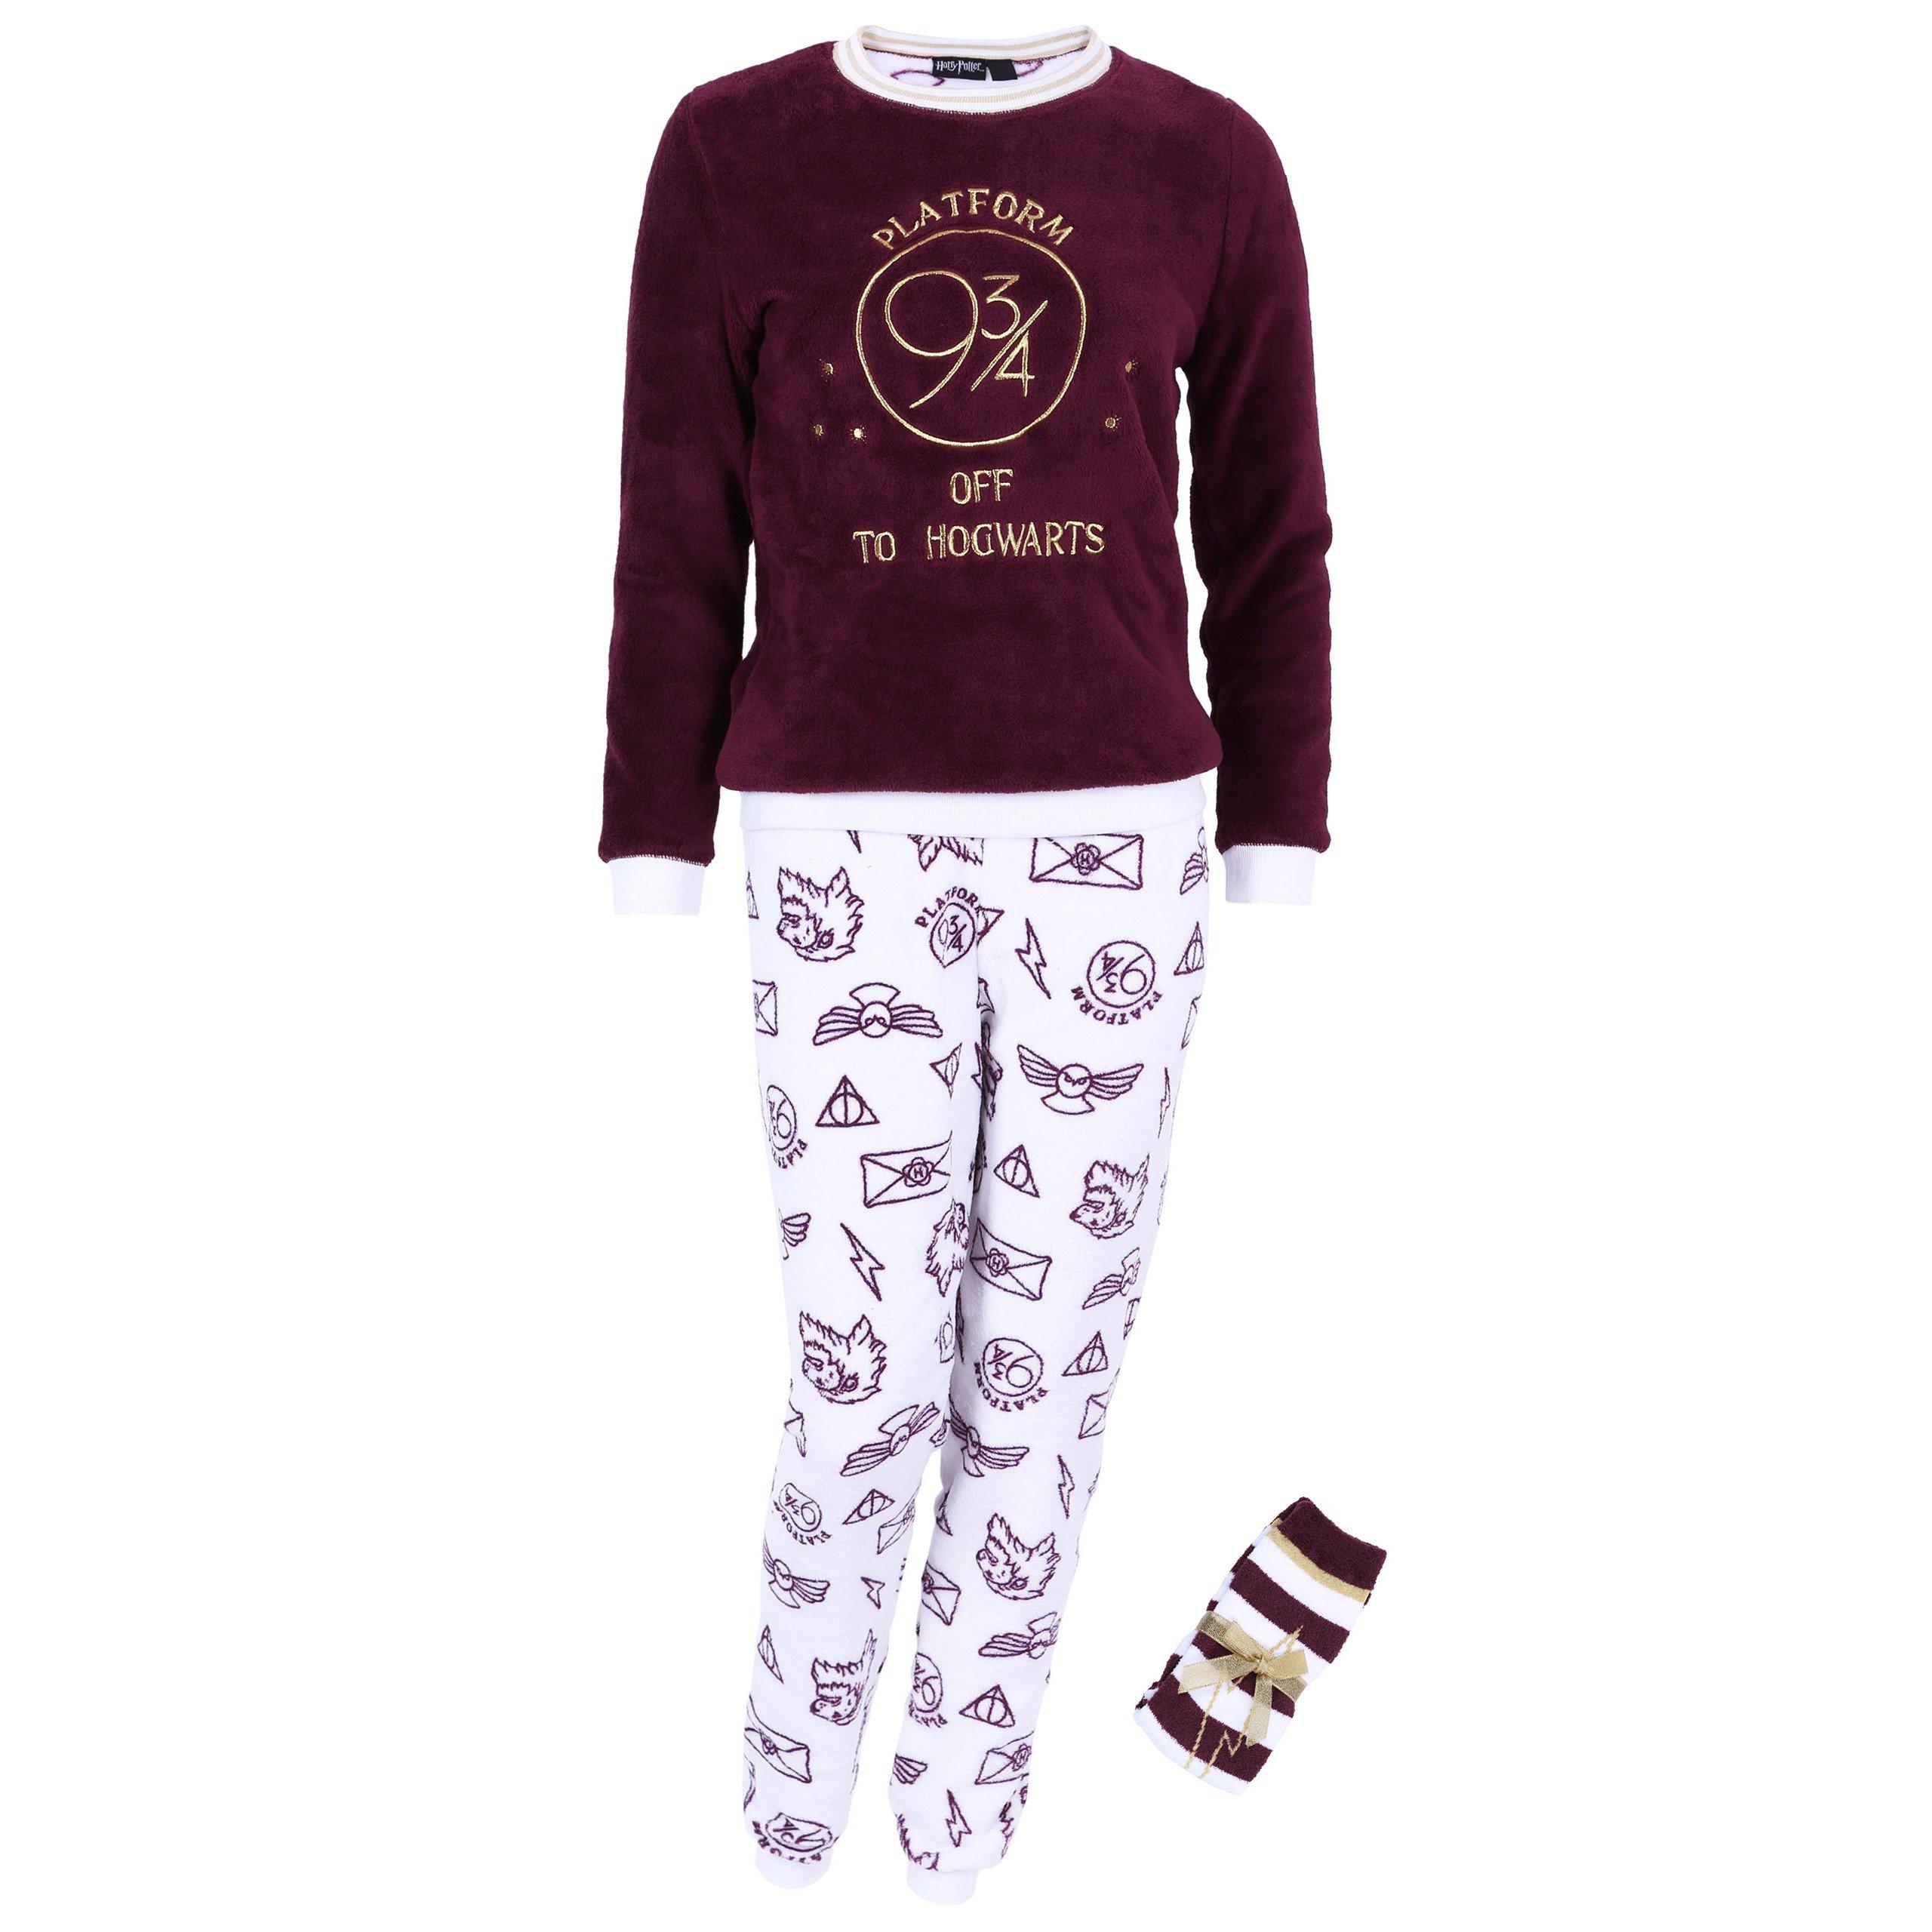 Harry Potter - Hogwarts - Pijama - para mujer product image